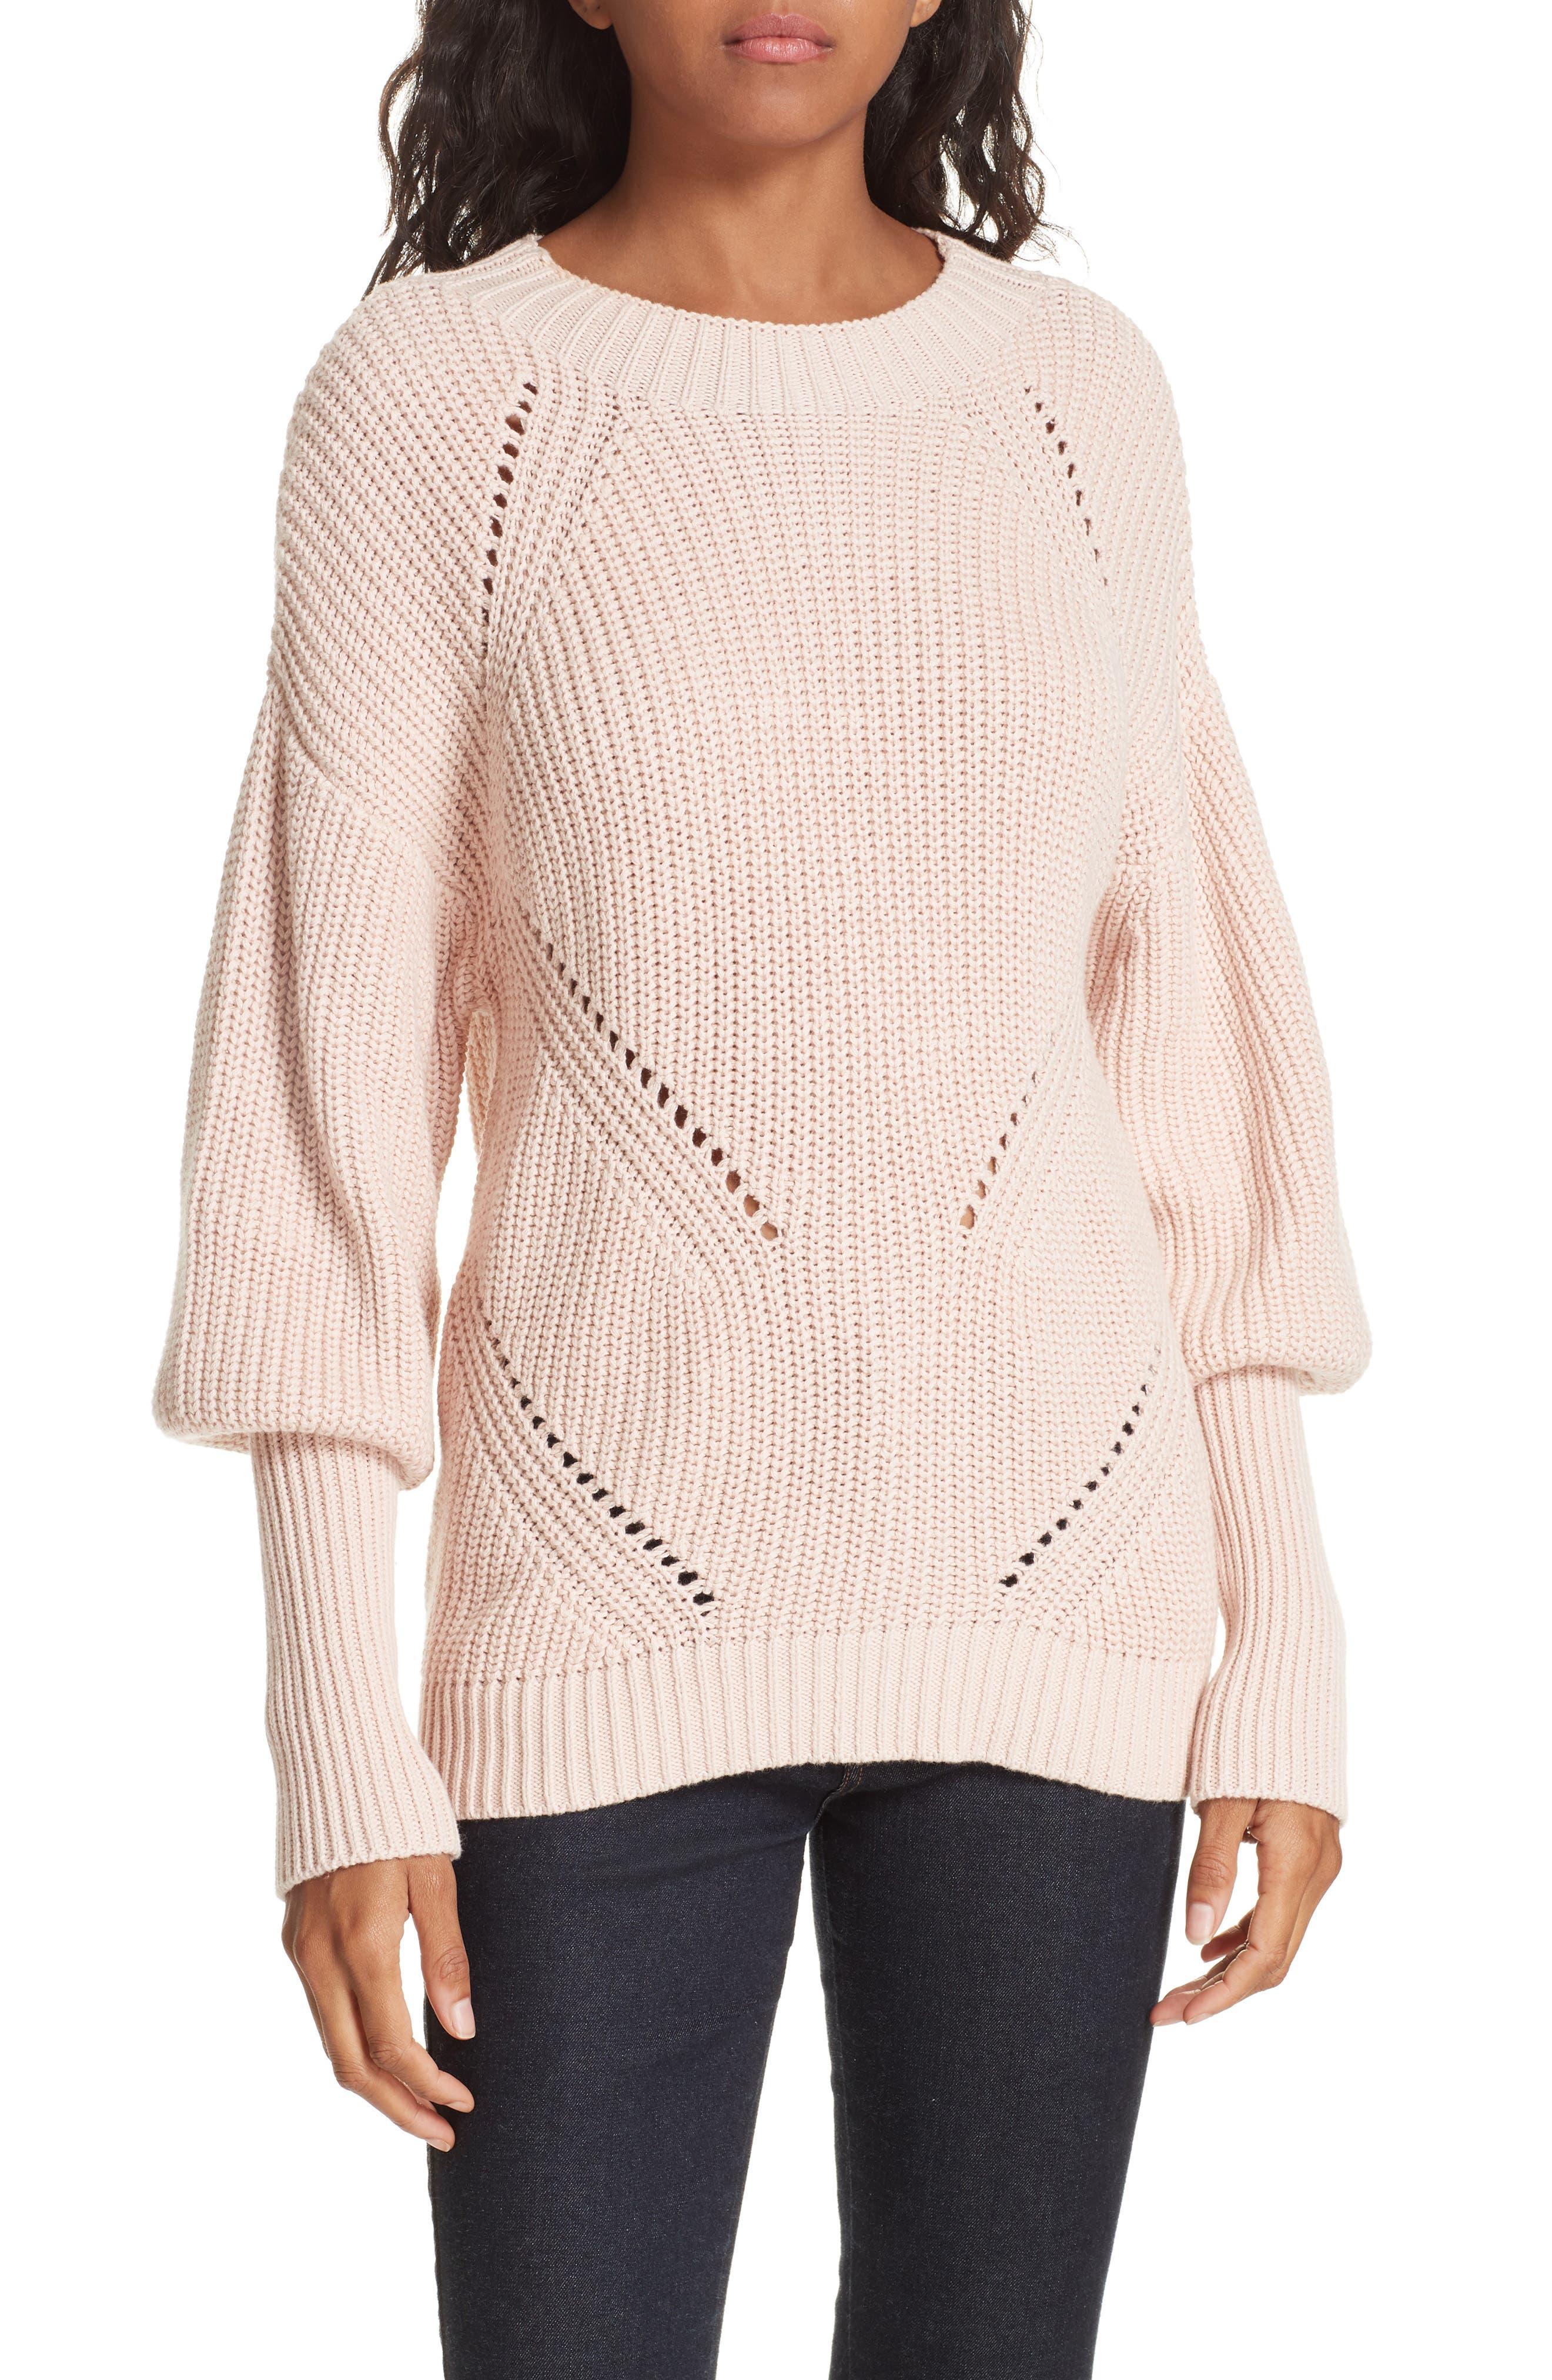 Landyn Blouson Sleeve Sweater,                             Main thumbnail 1, color,                             PINK SKY